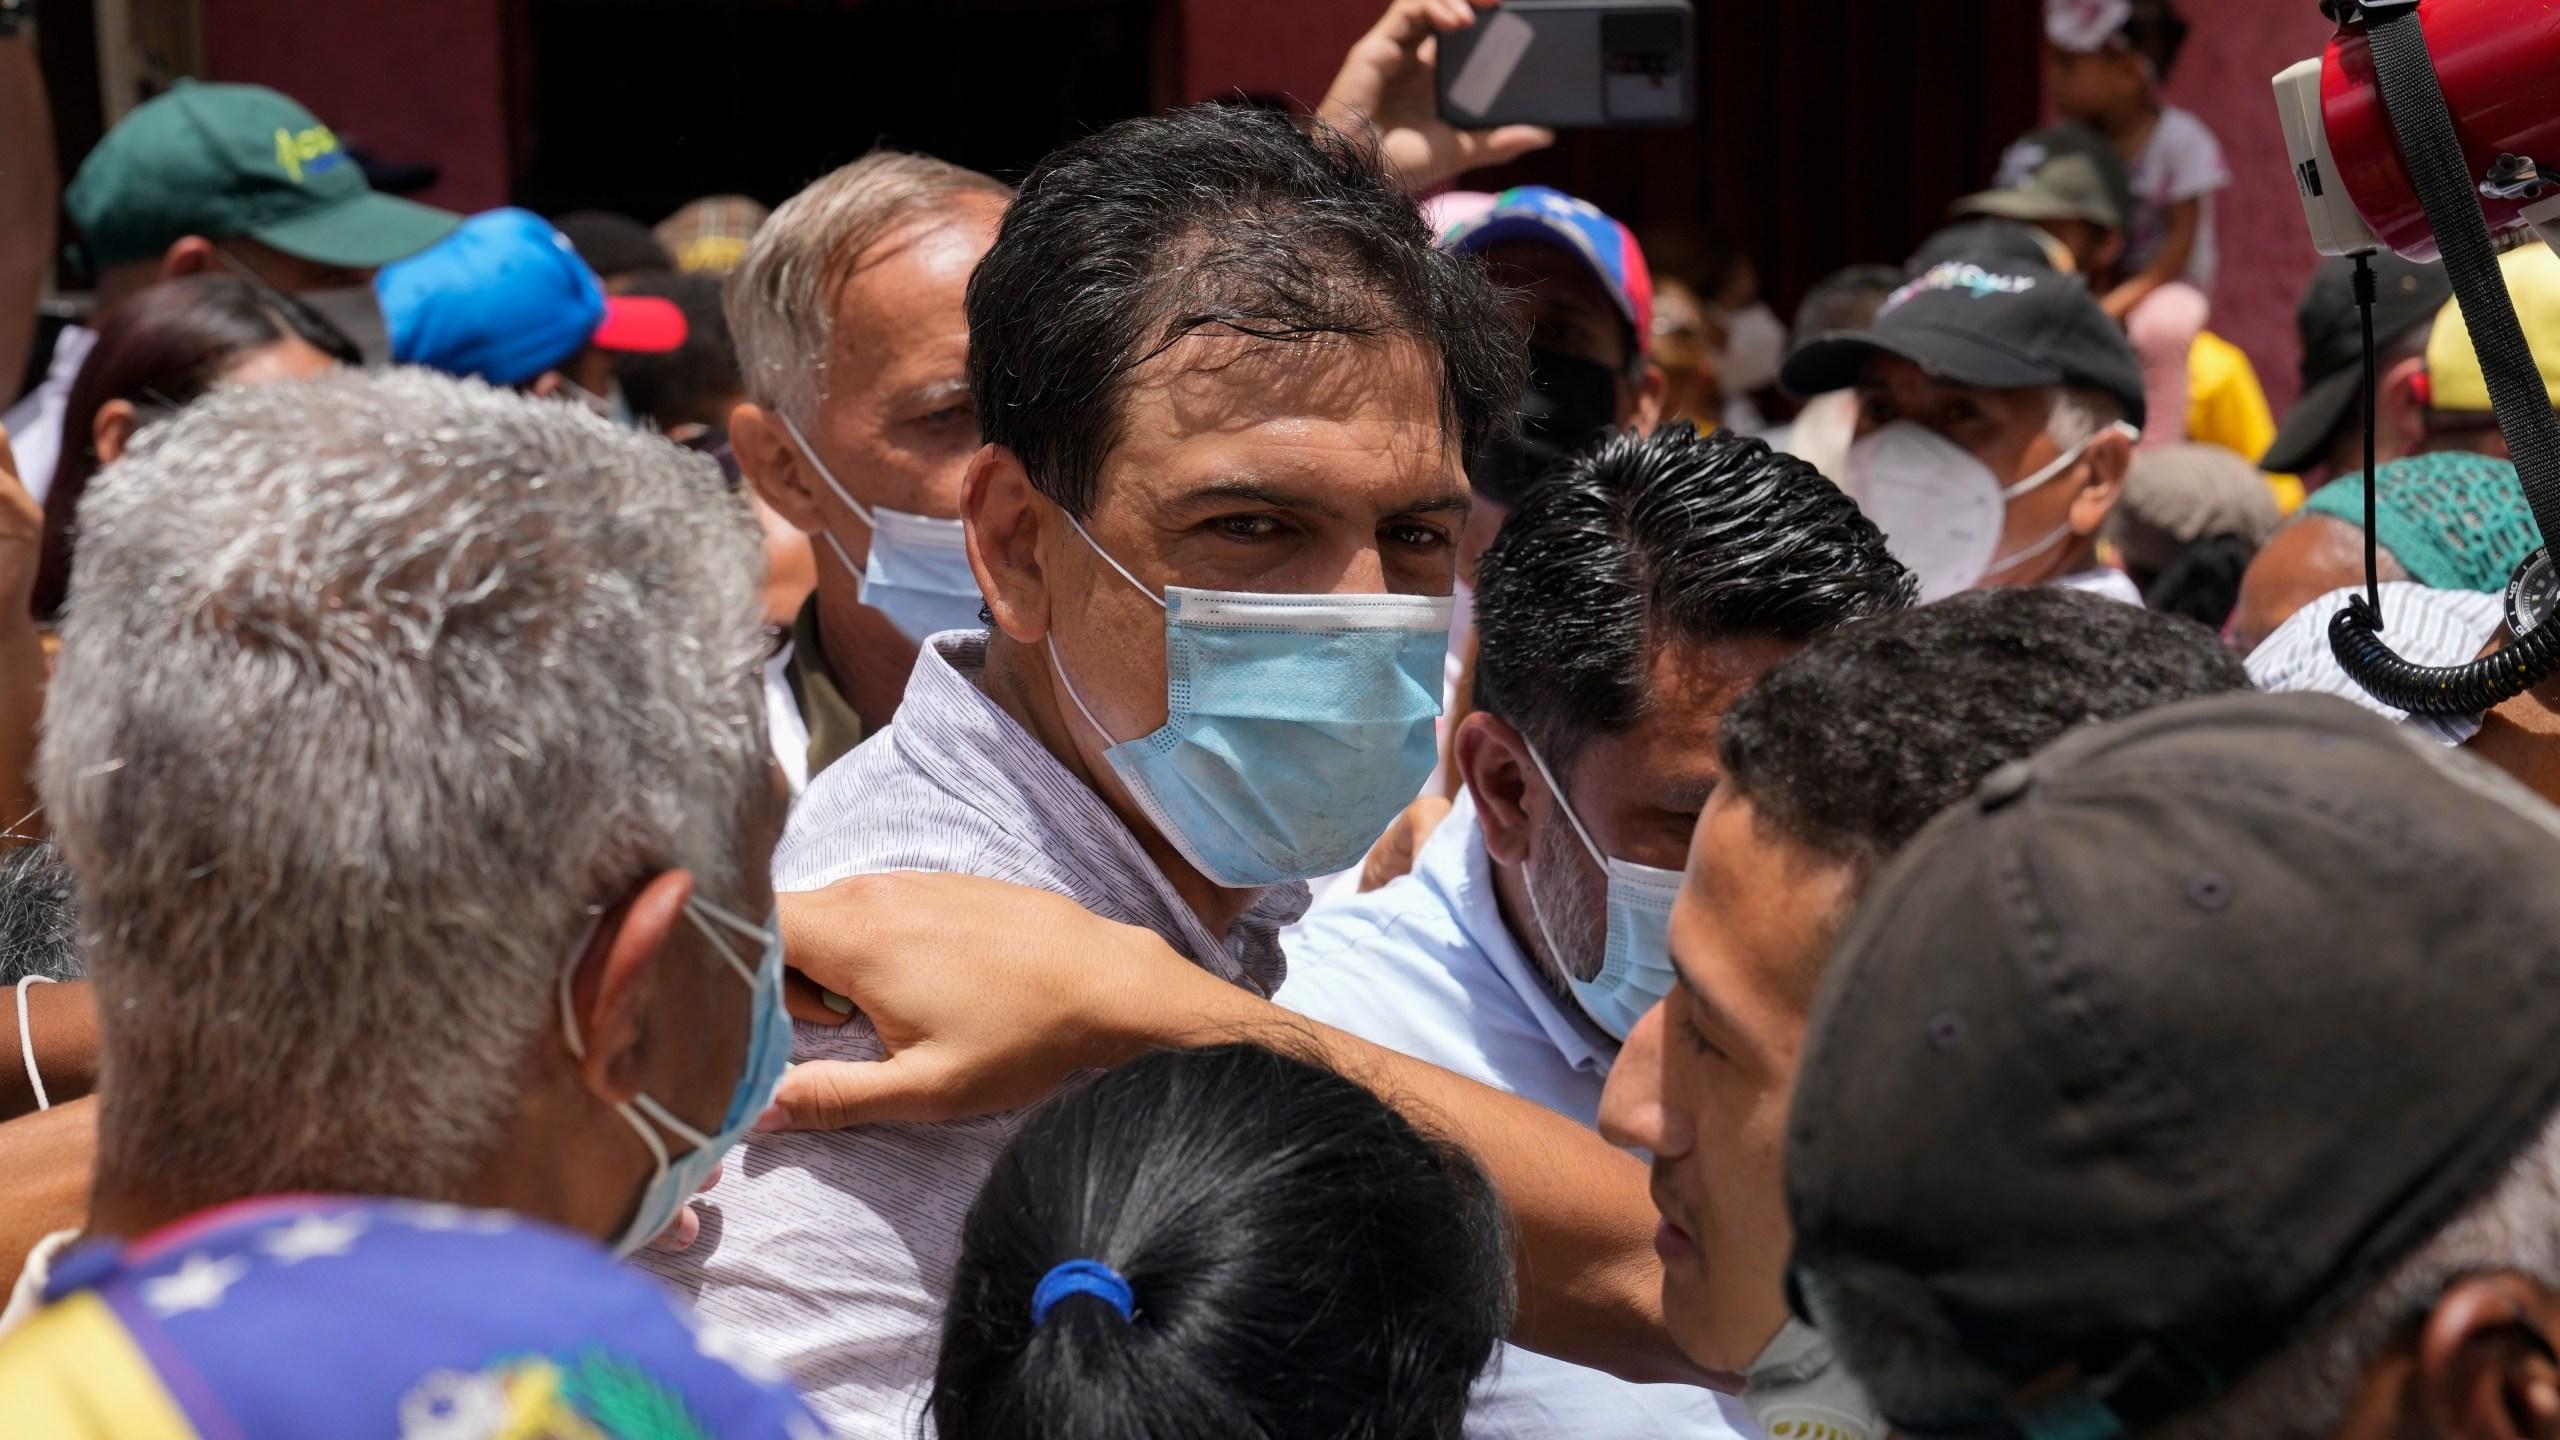 Carlos Ocariz